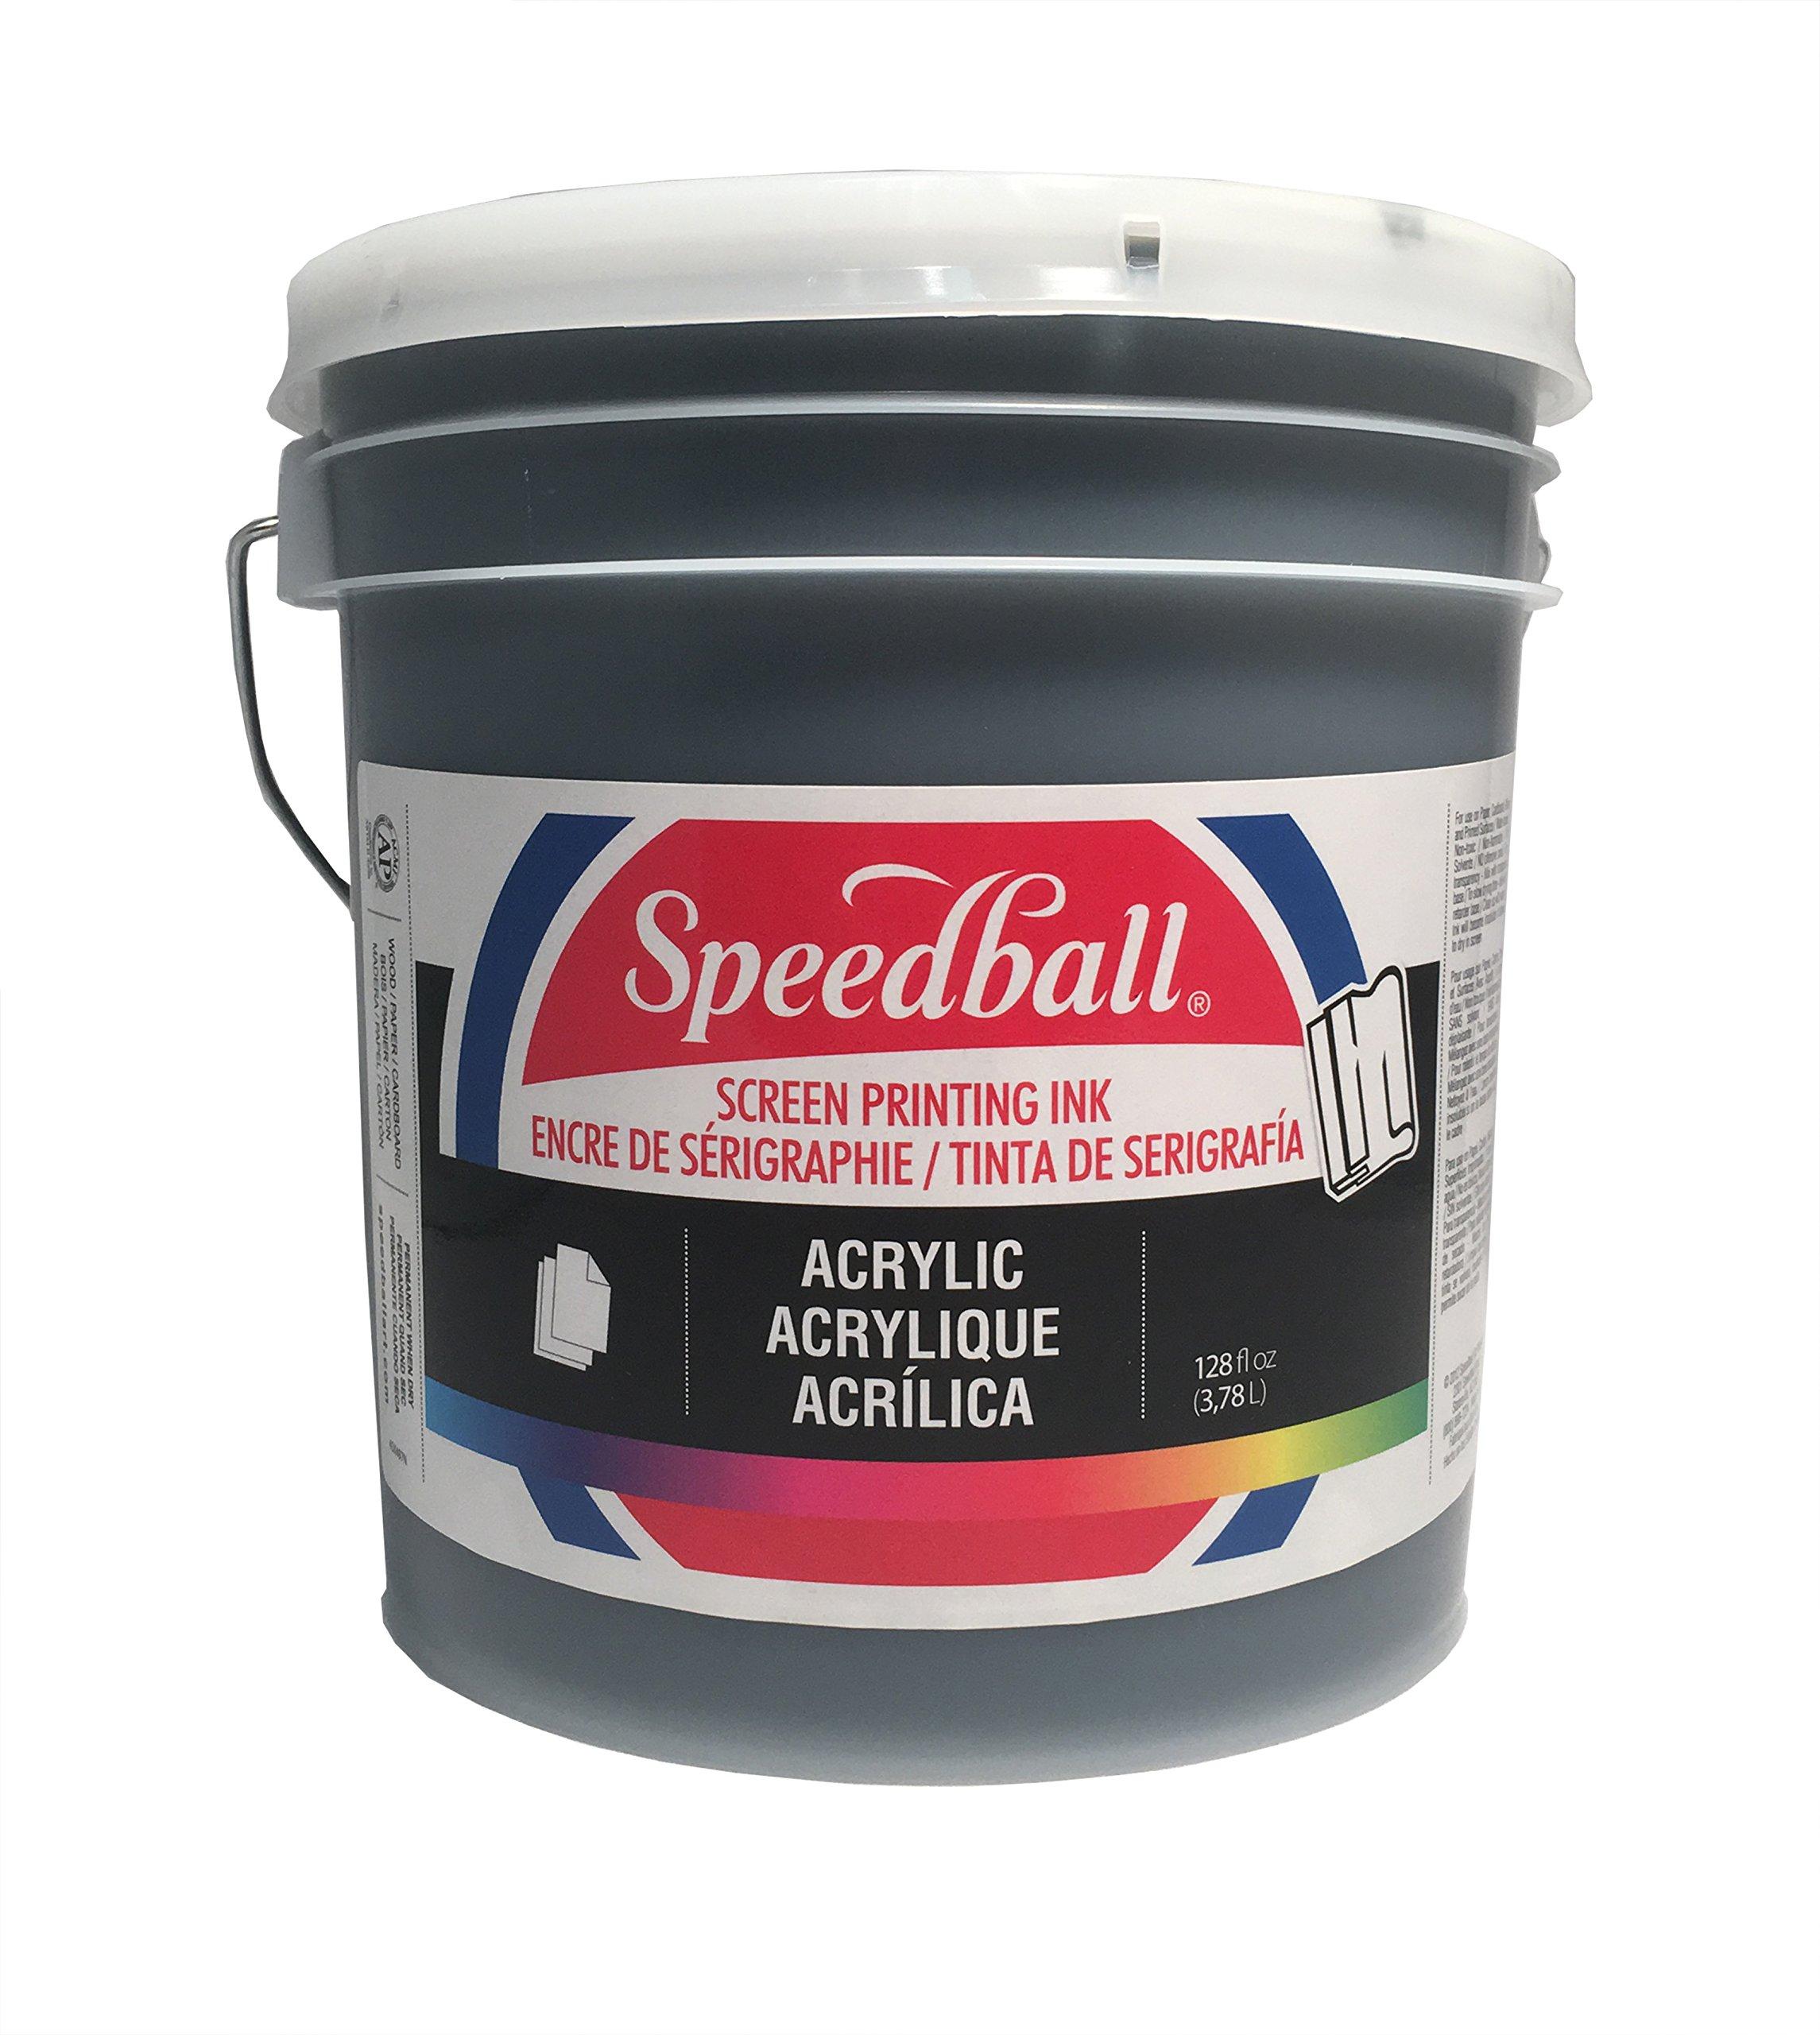 Speedball 004677 Acrylic Screen Printing Ink, 128 FL OZ, Black by Speedball